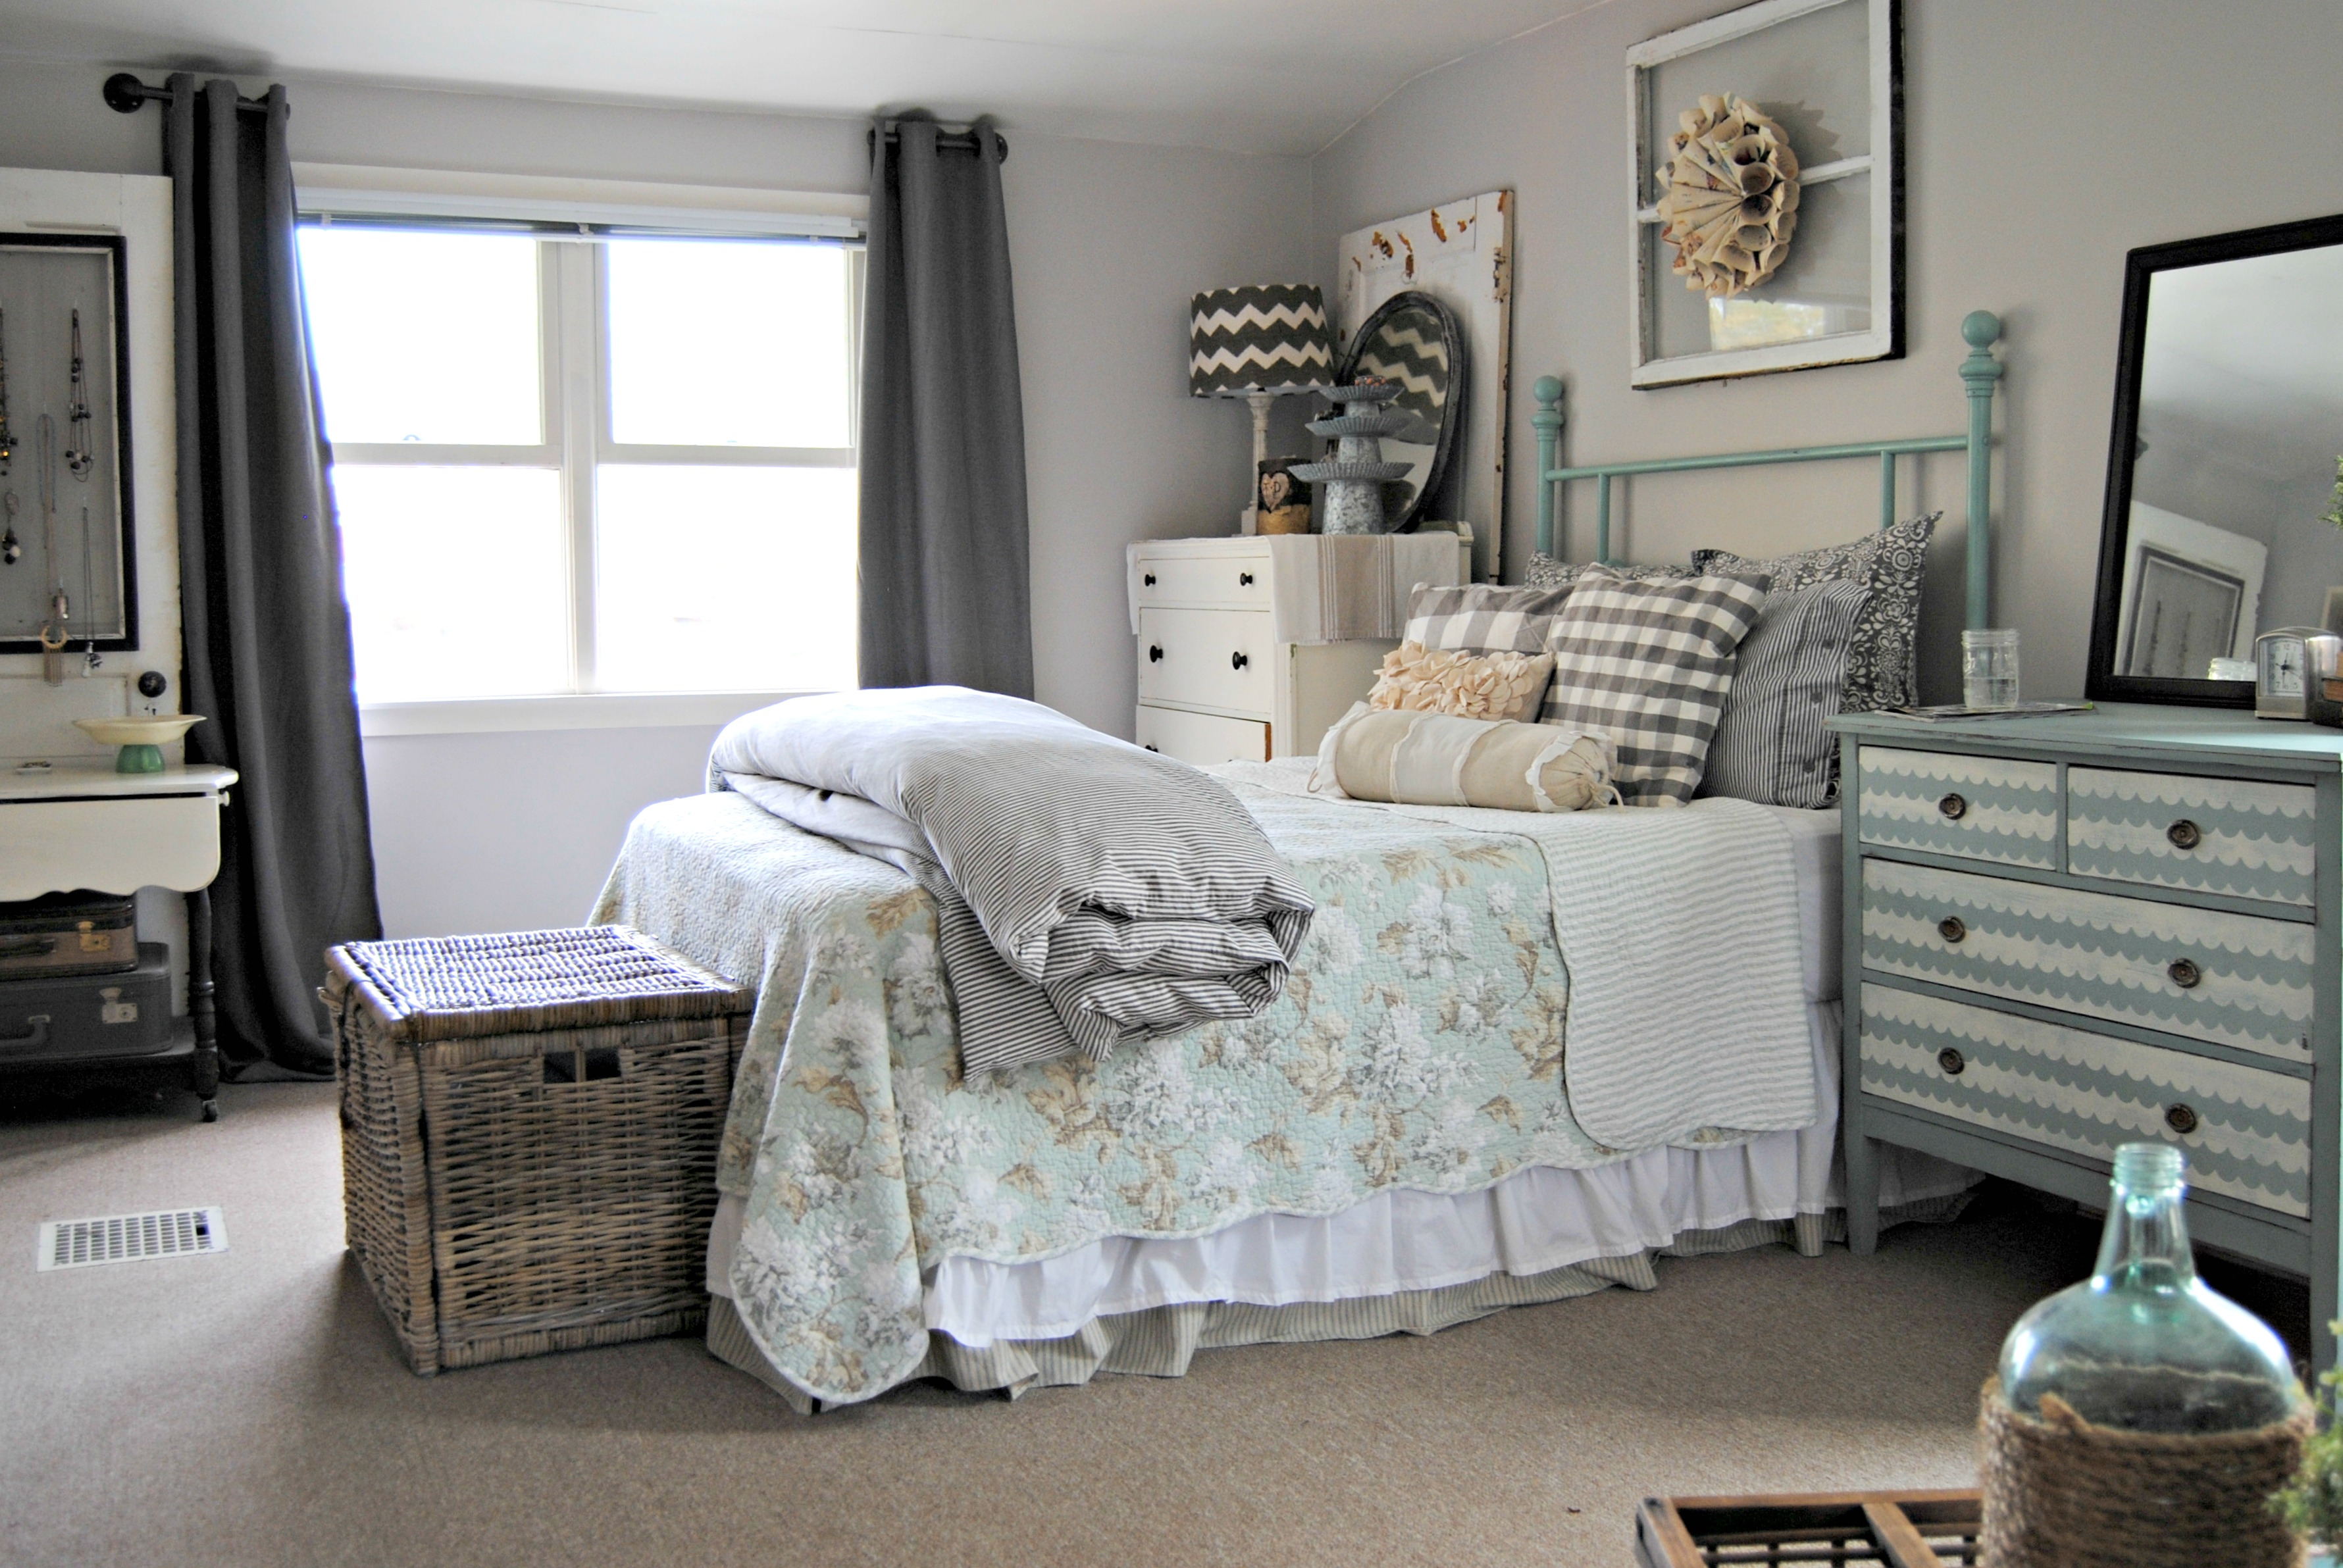 Cheap Design Ideas — Bedroom Decorating Ideas on Cheap Bedroom Ideas  id=63369